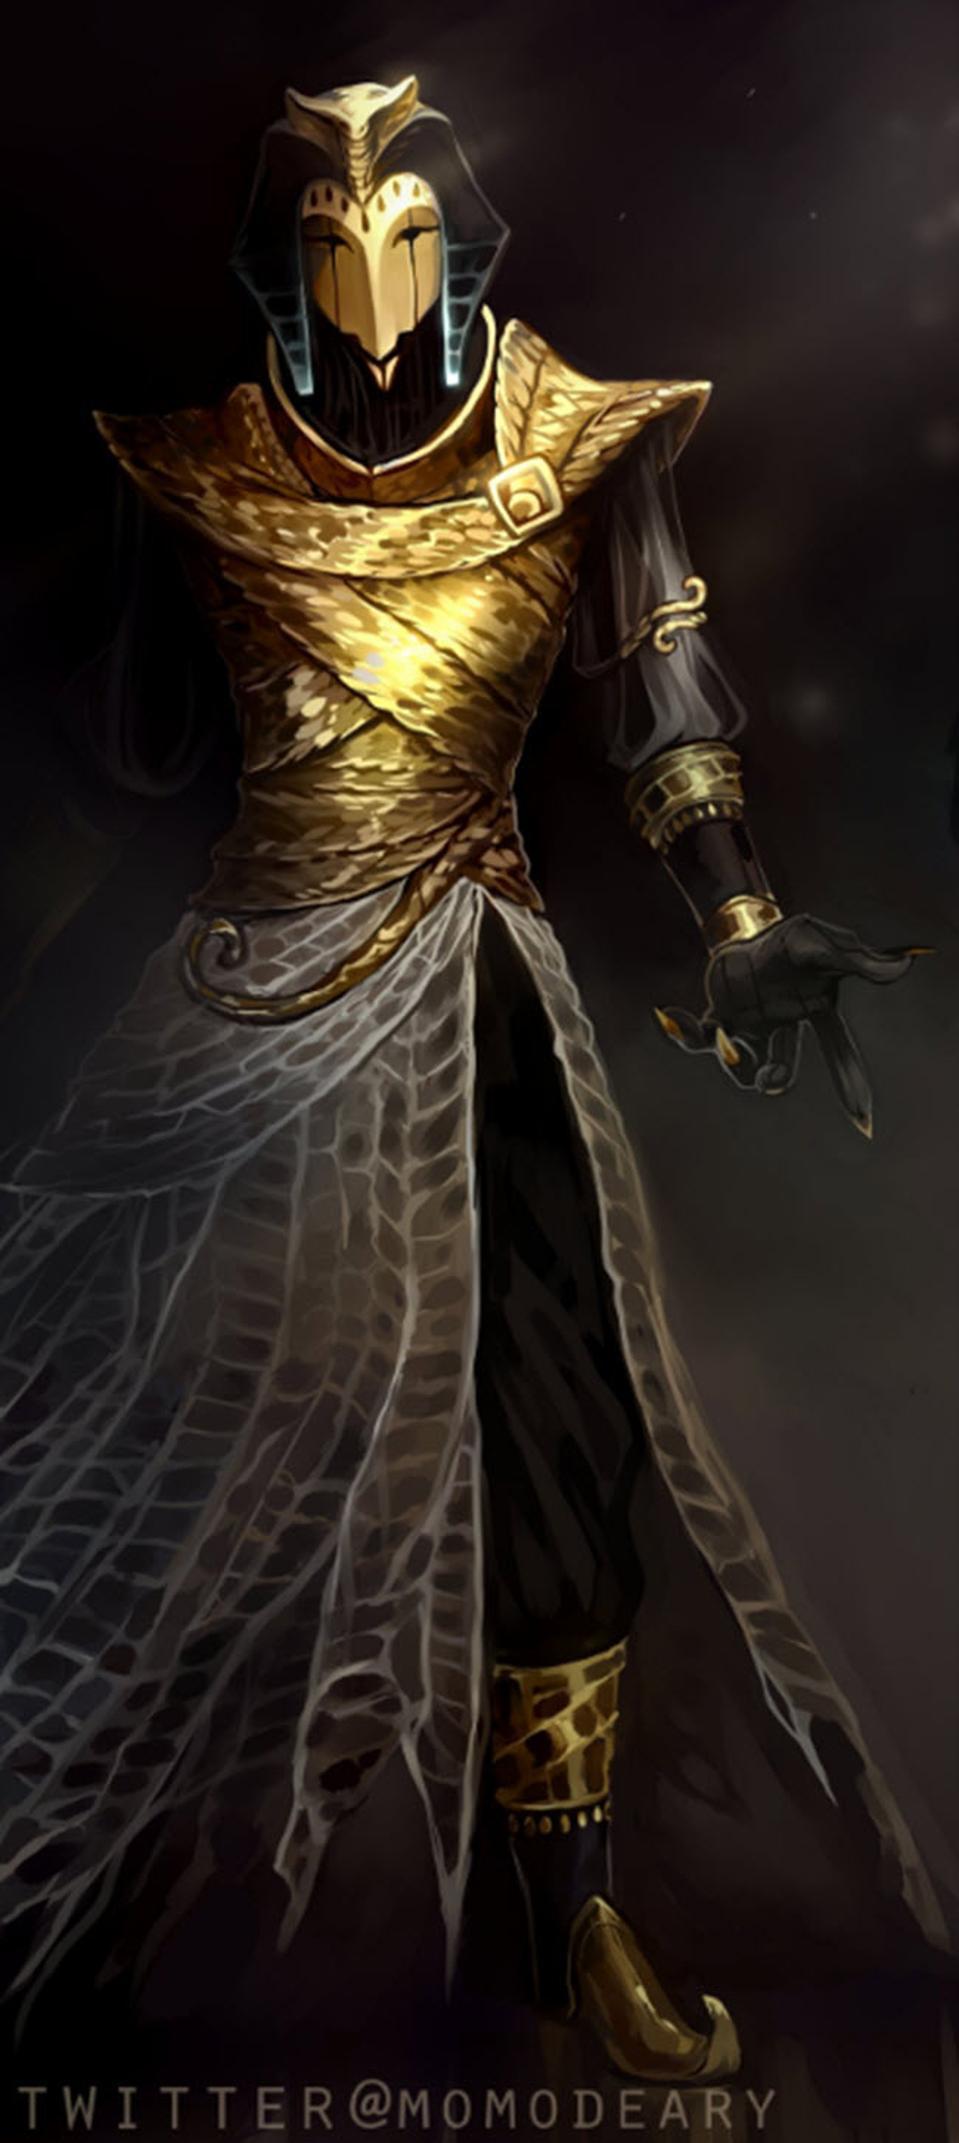 Hopefully Destiny 2 S Trials Of Osiris Armor Looks Half This Good